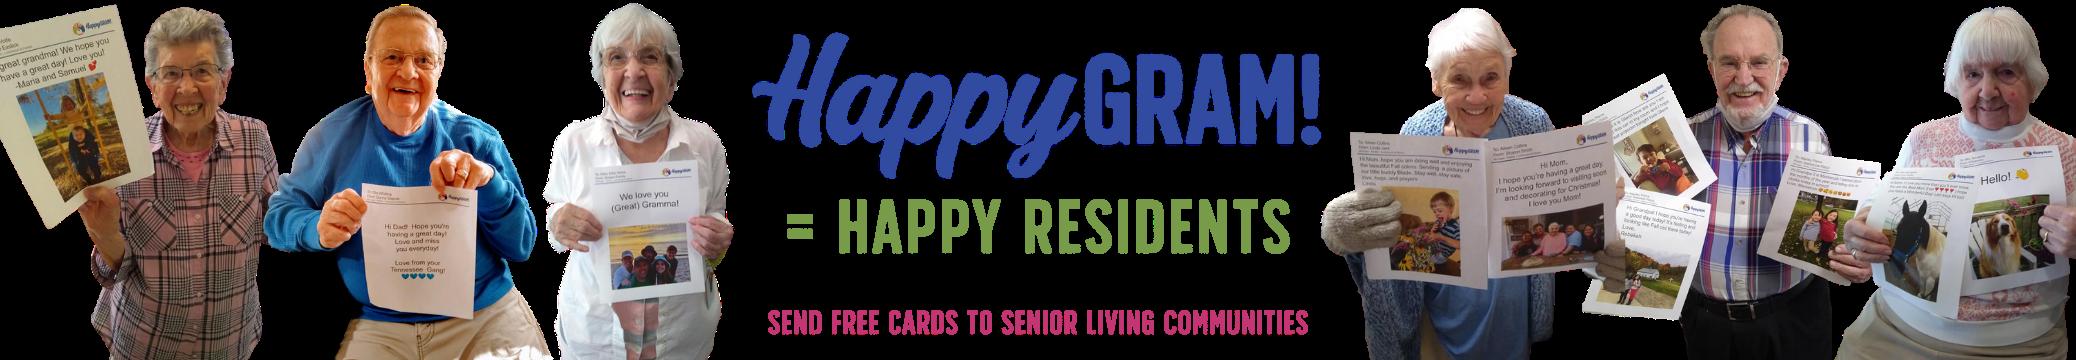 www.HappyGram.org - Send Free Cards to Senior Living Communities